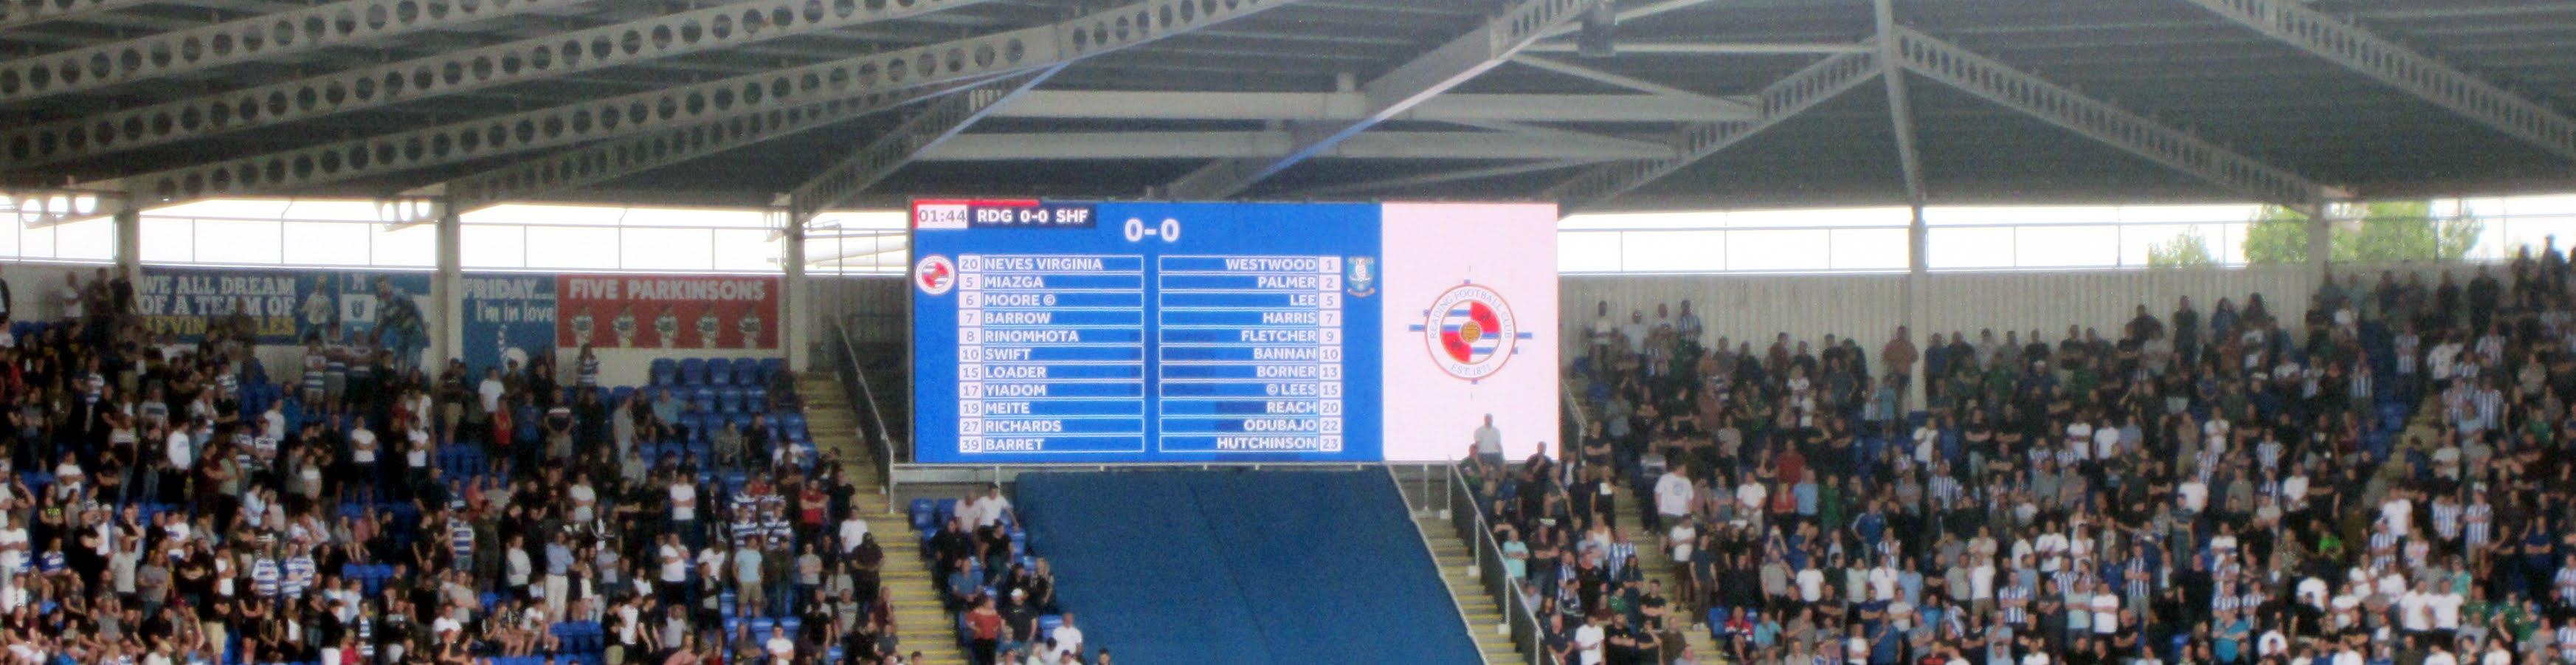 Video screen at Madejski Stadium